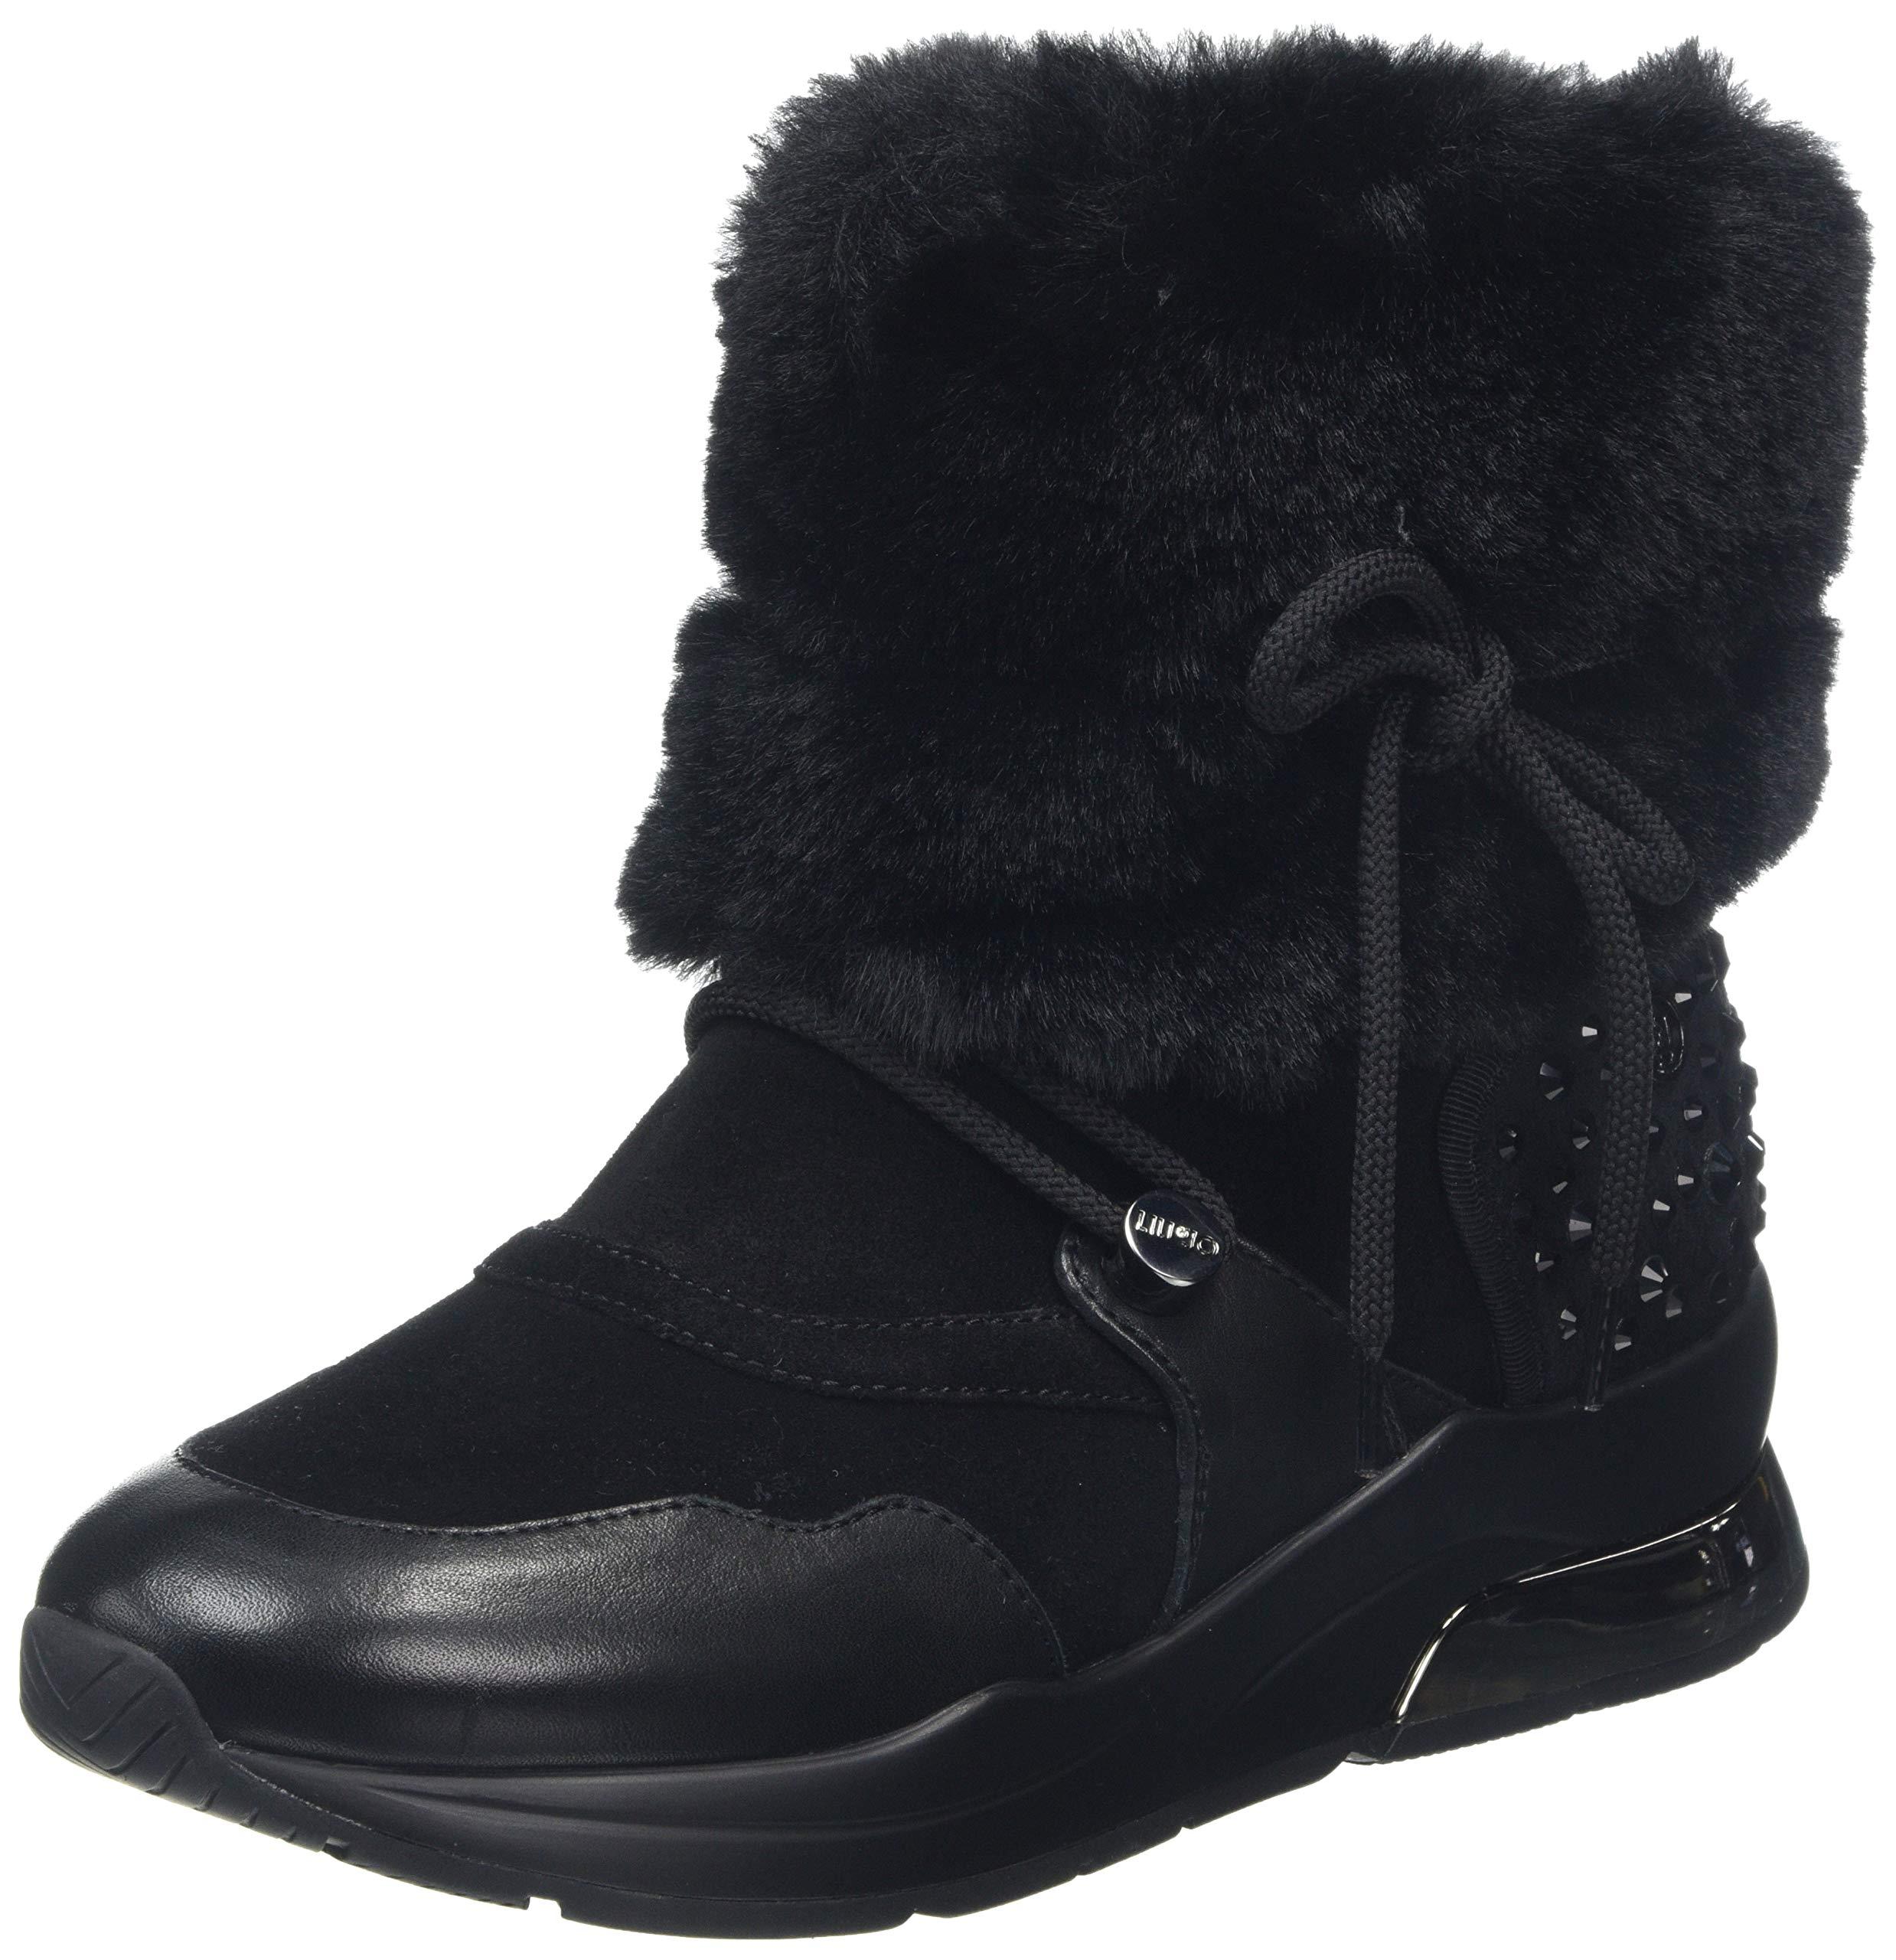 Eu blckBotines 34 Cow Sued Shoes Karlie Booty 2222236 FemmeNoirblack Jo Liu linFur lF3TKJu1c